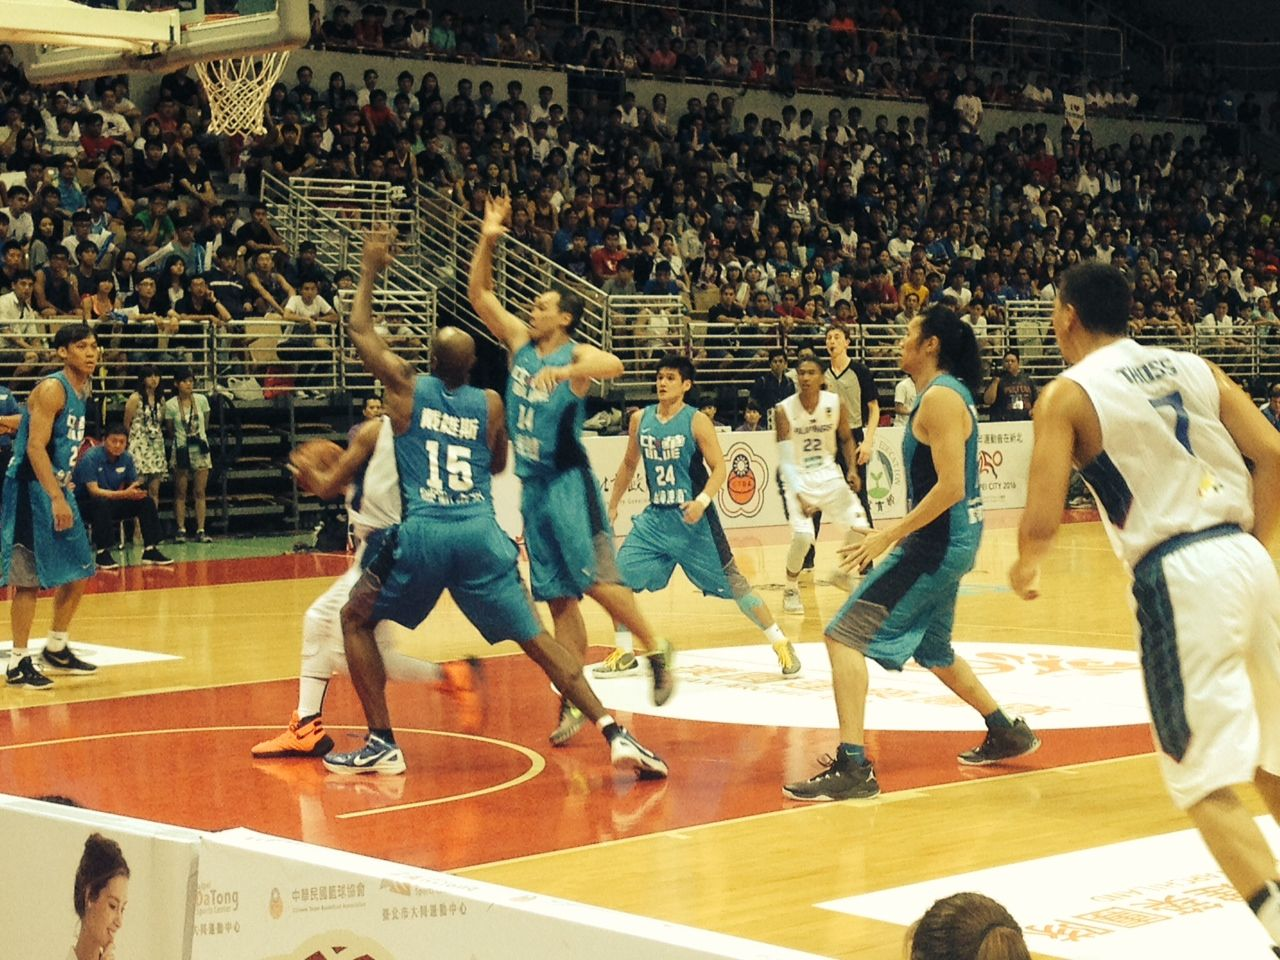 New boys Romeo, Abueva impress in Jones Cup debut as Gilas beats host Taipei